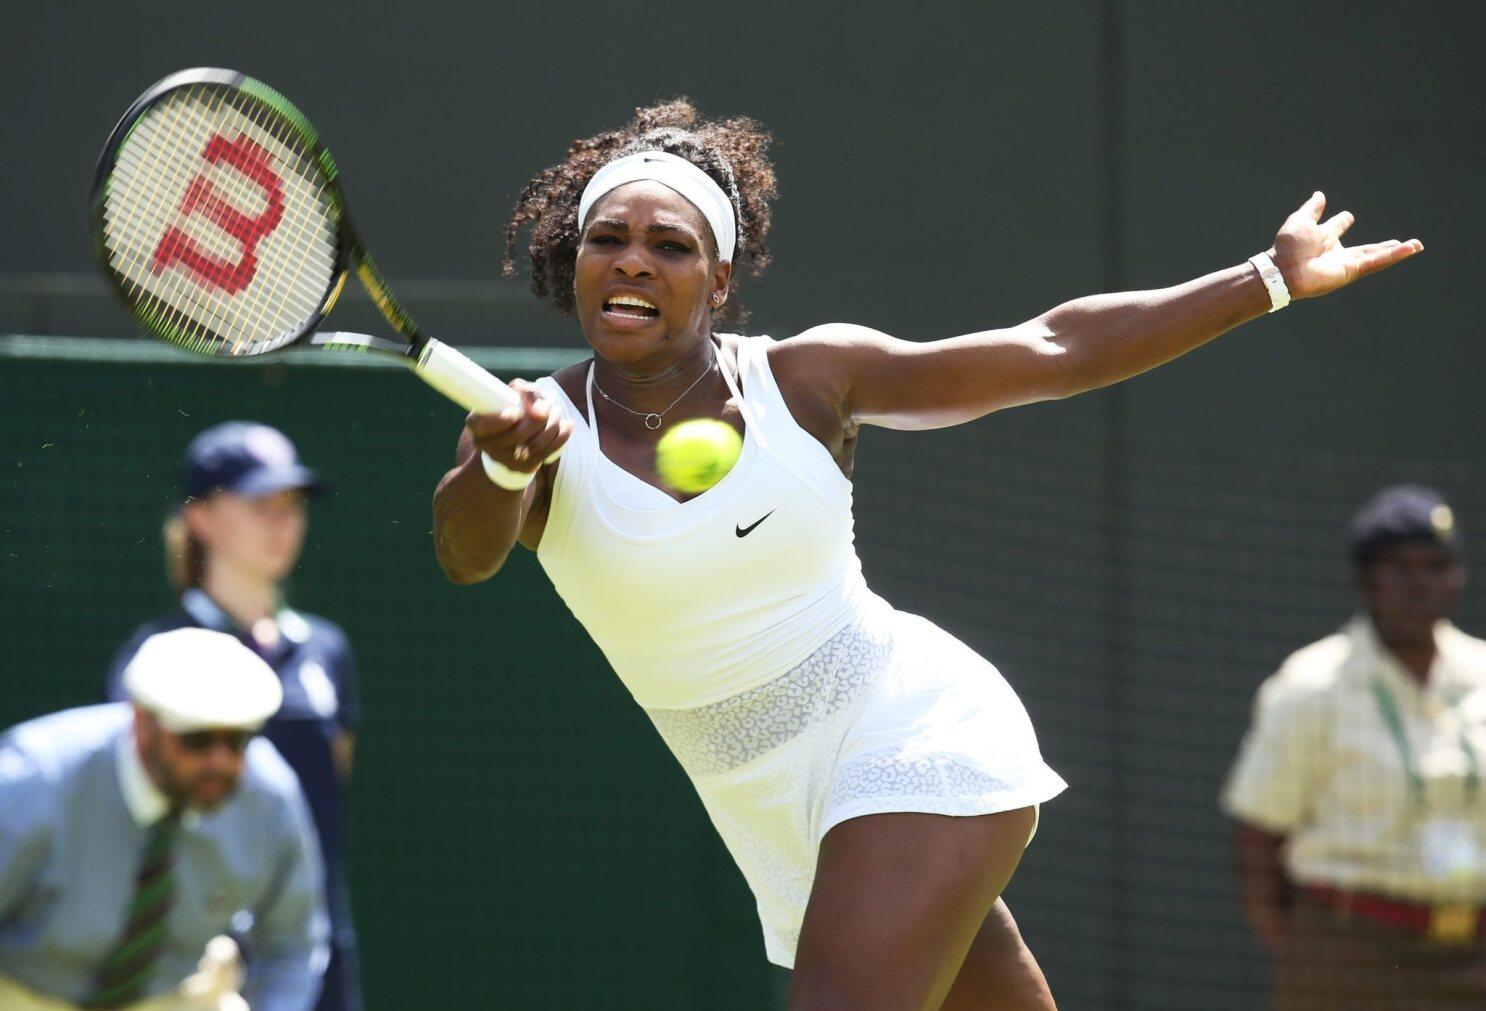 Serena Williams Novak Djokovic Advance At Wimbledon Los Angeles Times